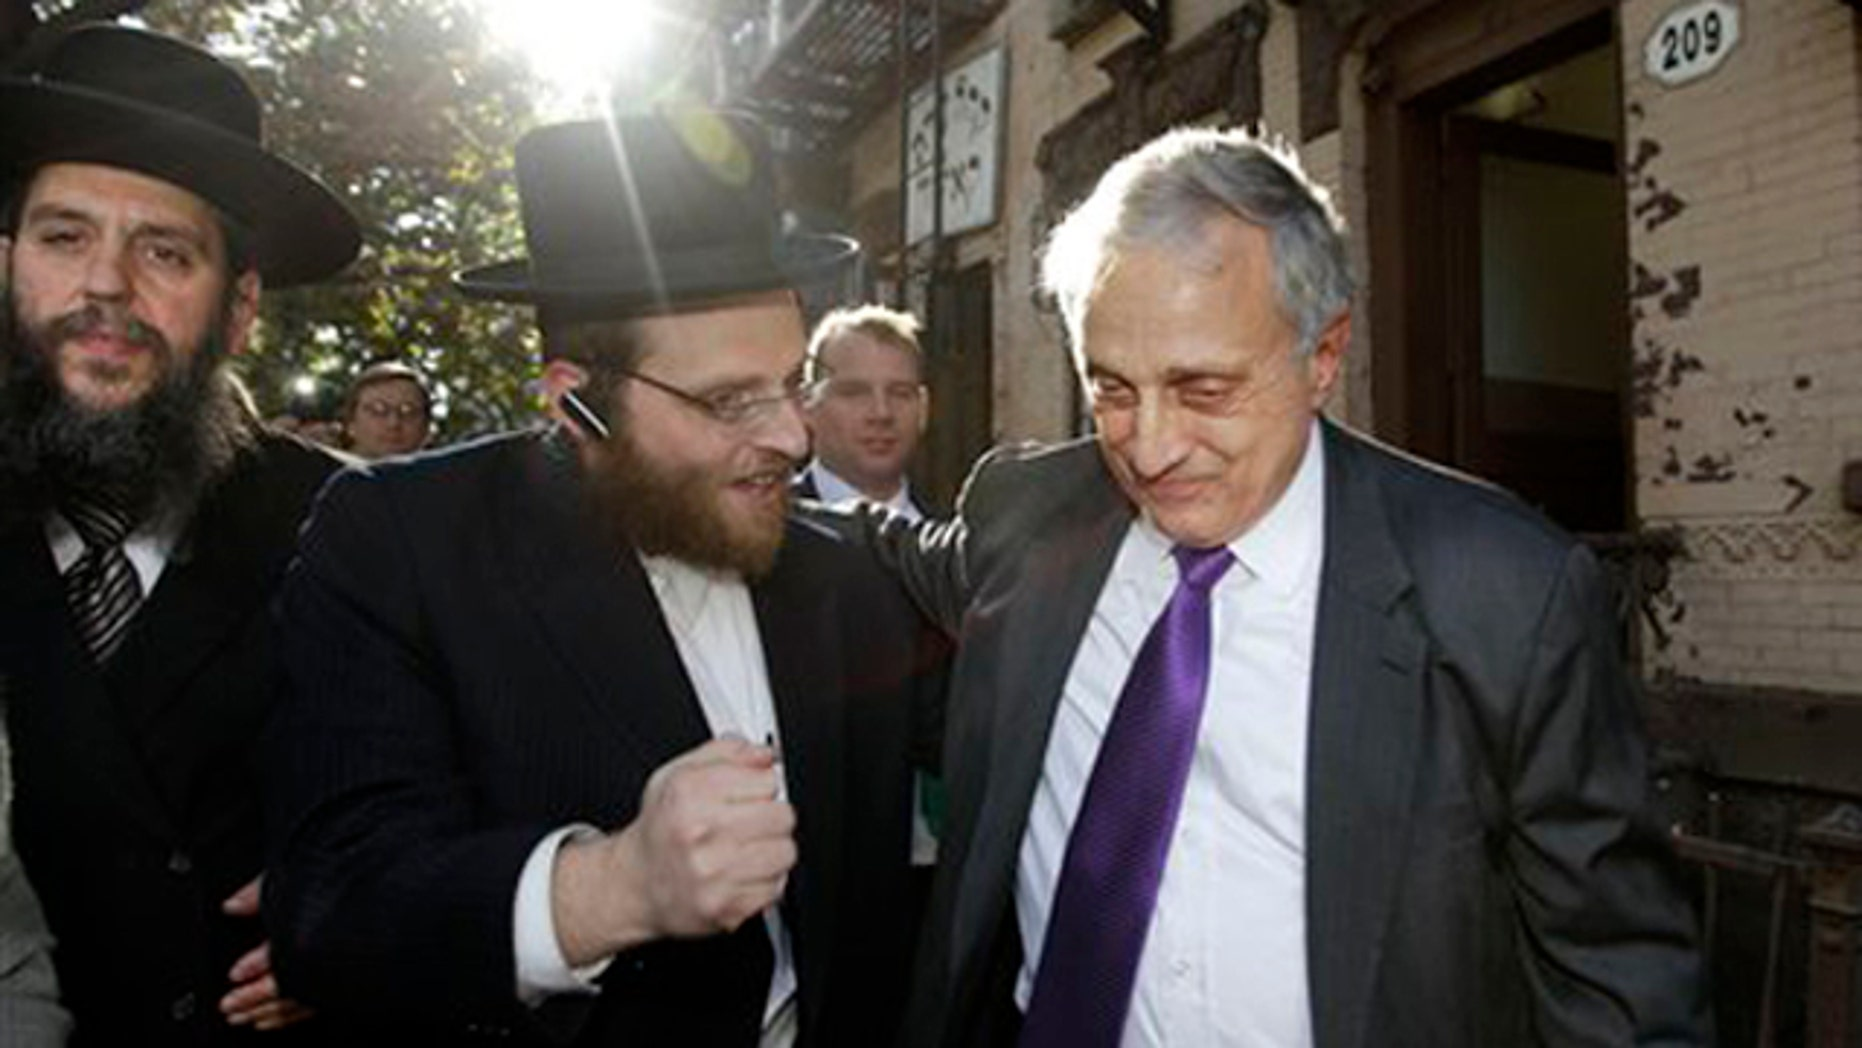 Rabbi Yechezkel Roth, left, and another Orthodox Jewish supporter, center, accompany New York Republican gubernatorial candidate Carl Paladino in the Williamsburg neighborhood of Brooklyn Oct. 10. (AP Photo)